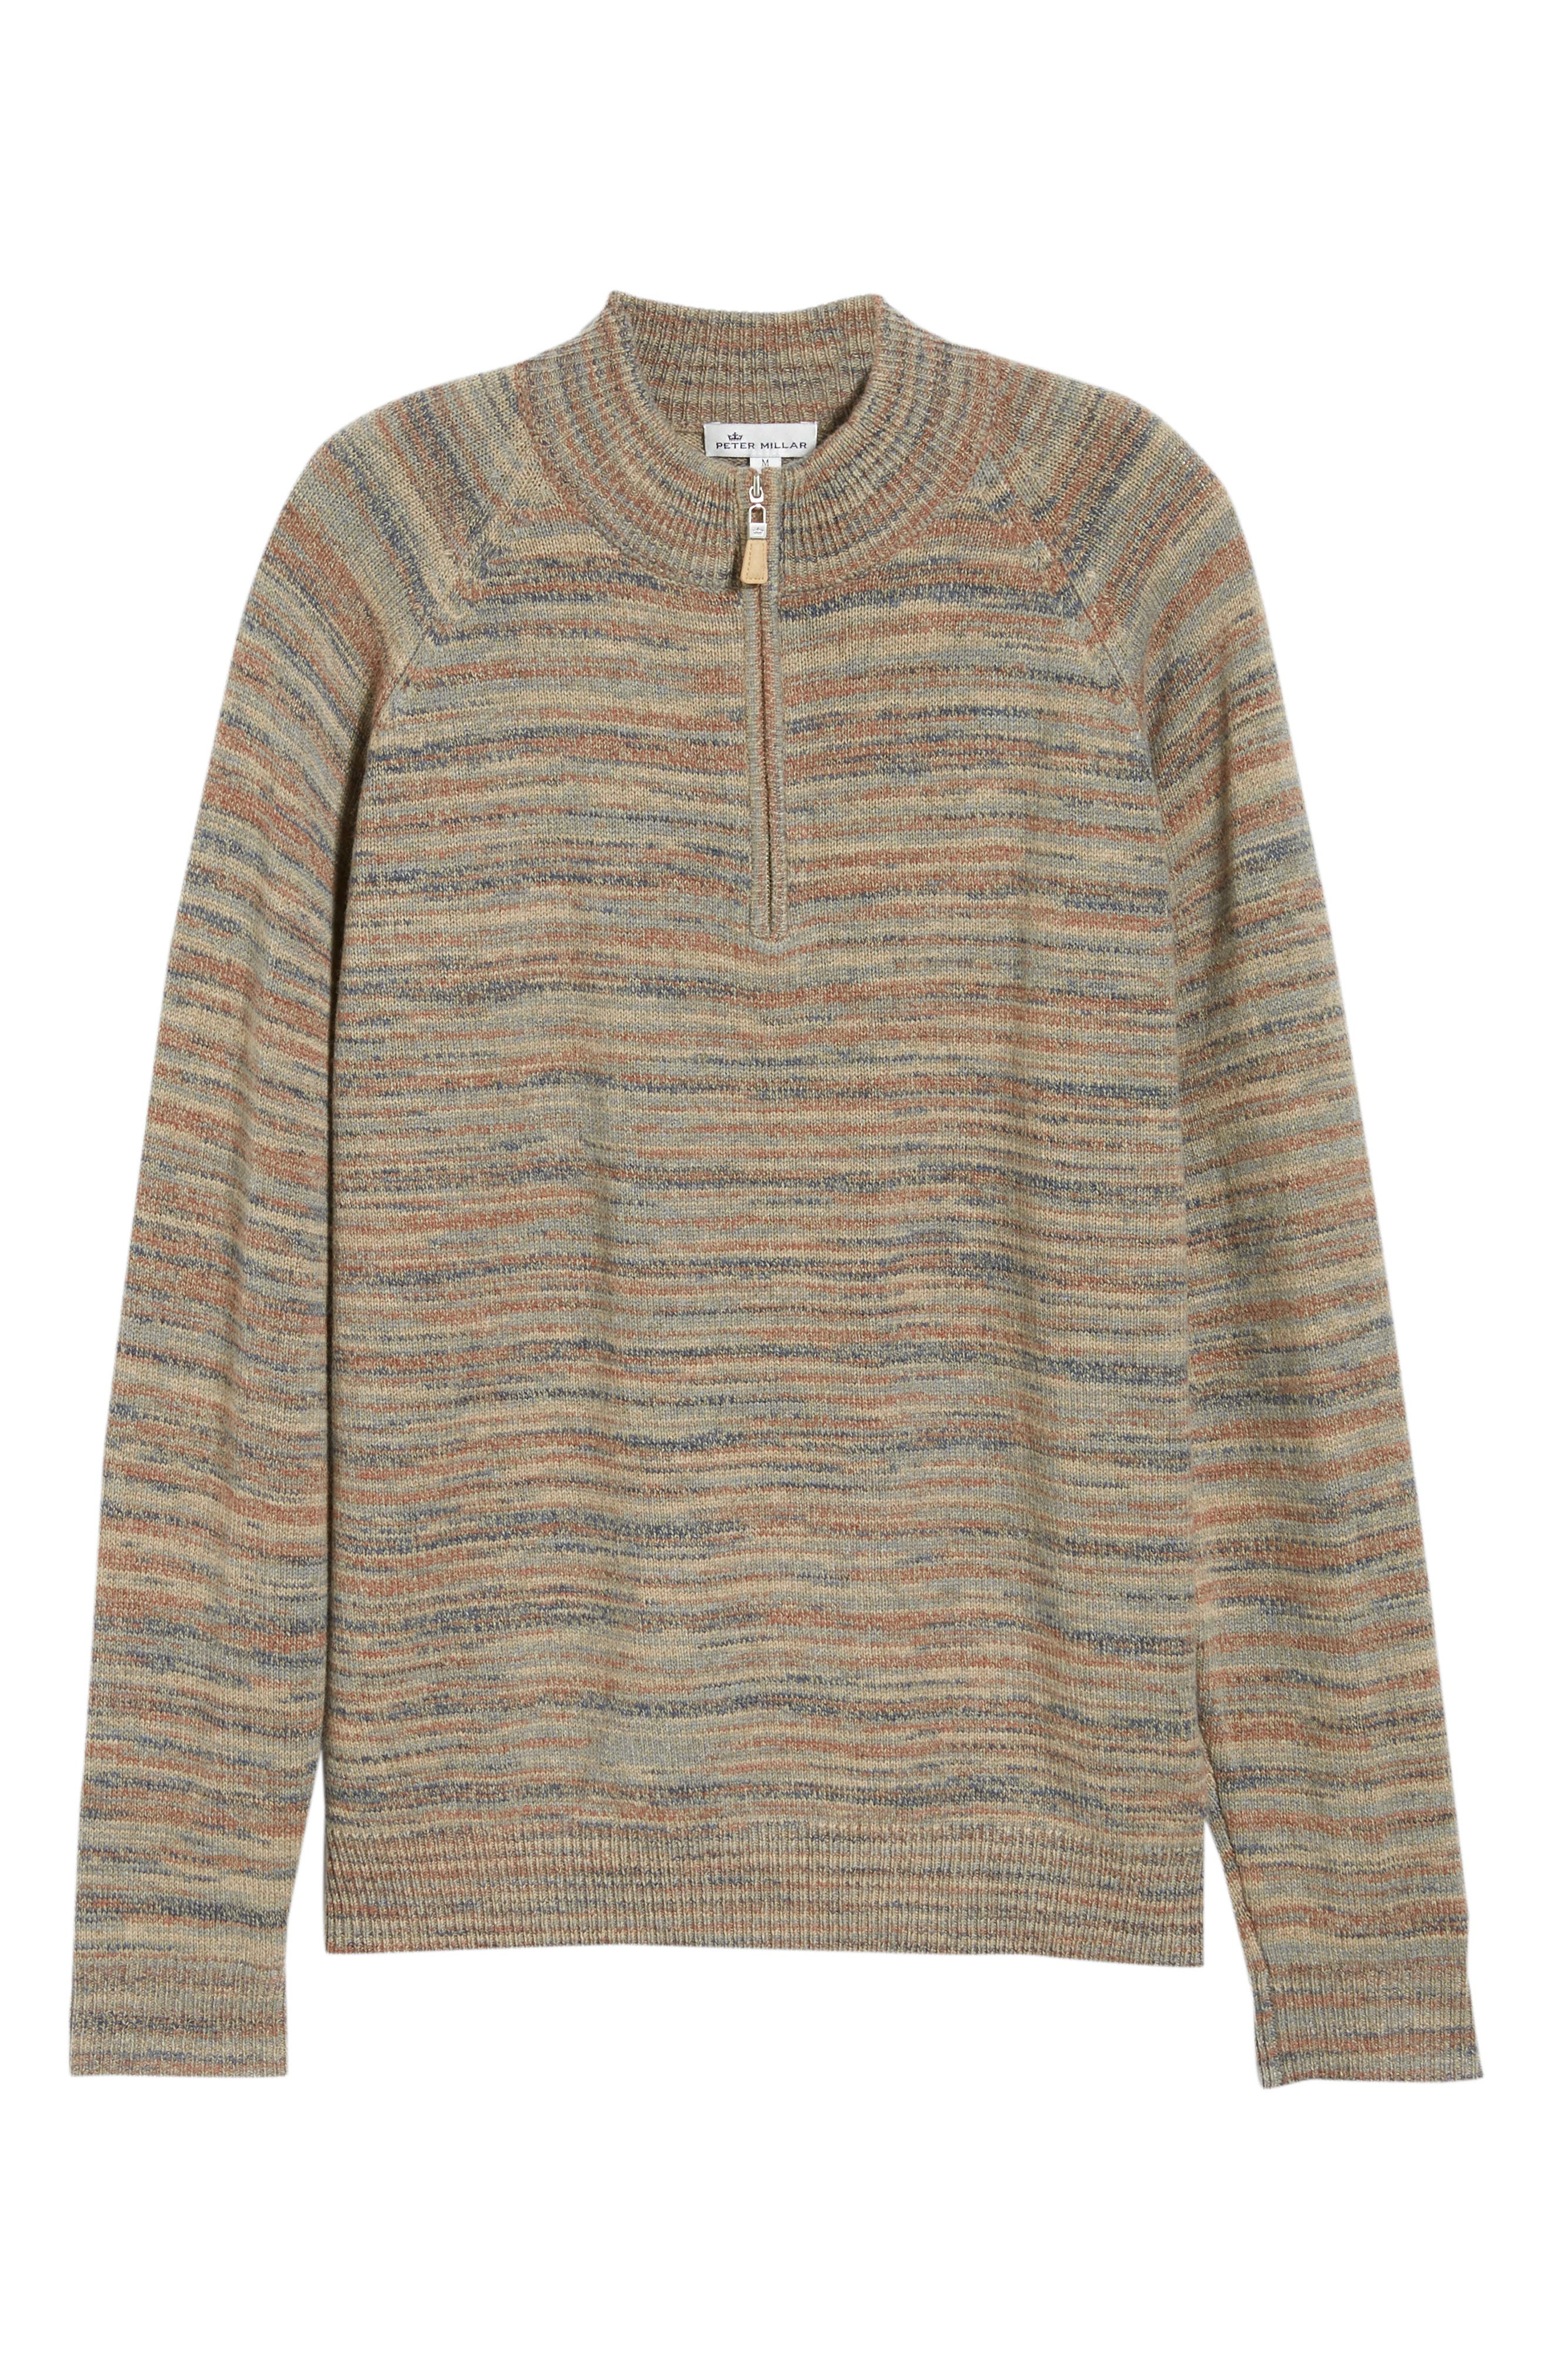 Twisted Cashmere Quarter Zip Sweater,                             Alternate thumbnail 6, color,                             BEIGE